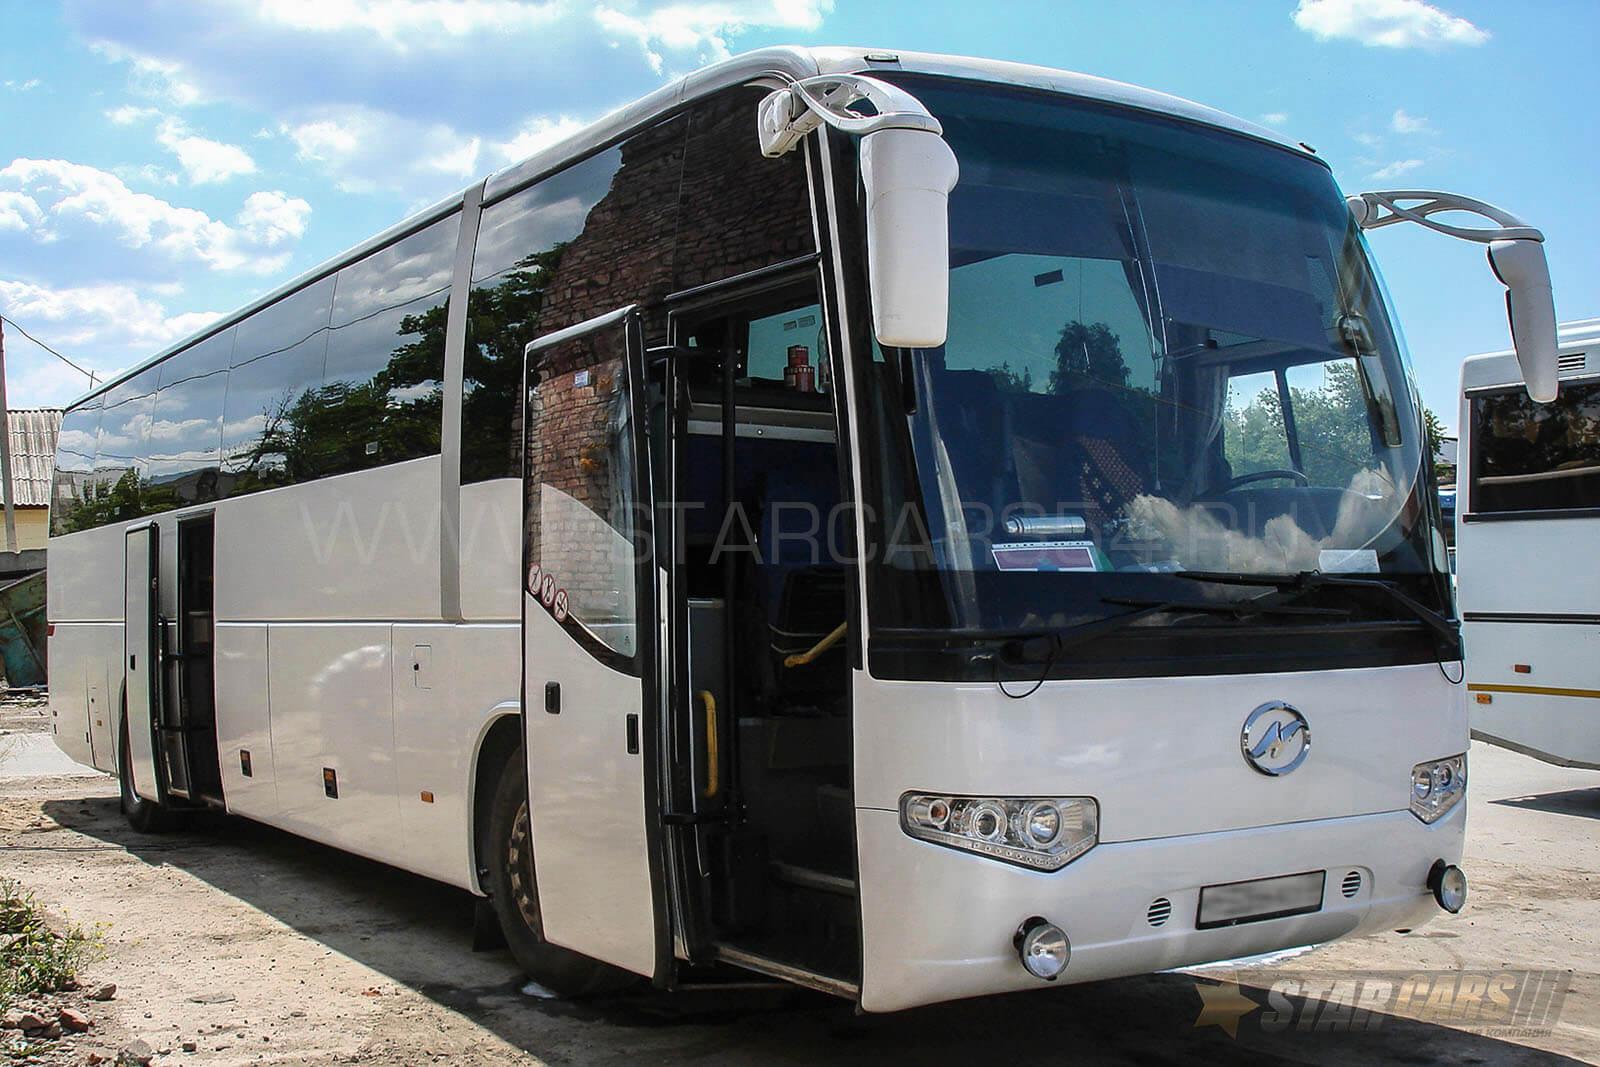 Аренда автобуса Higer (49 мест) в Новосибирске: ? заказ автобусов с водителем — StarCars54.ru